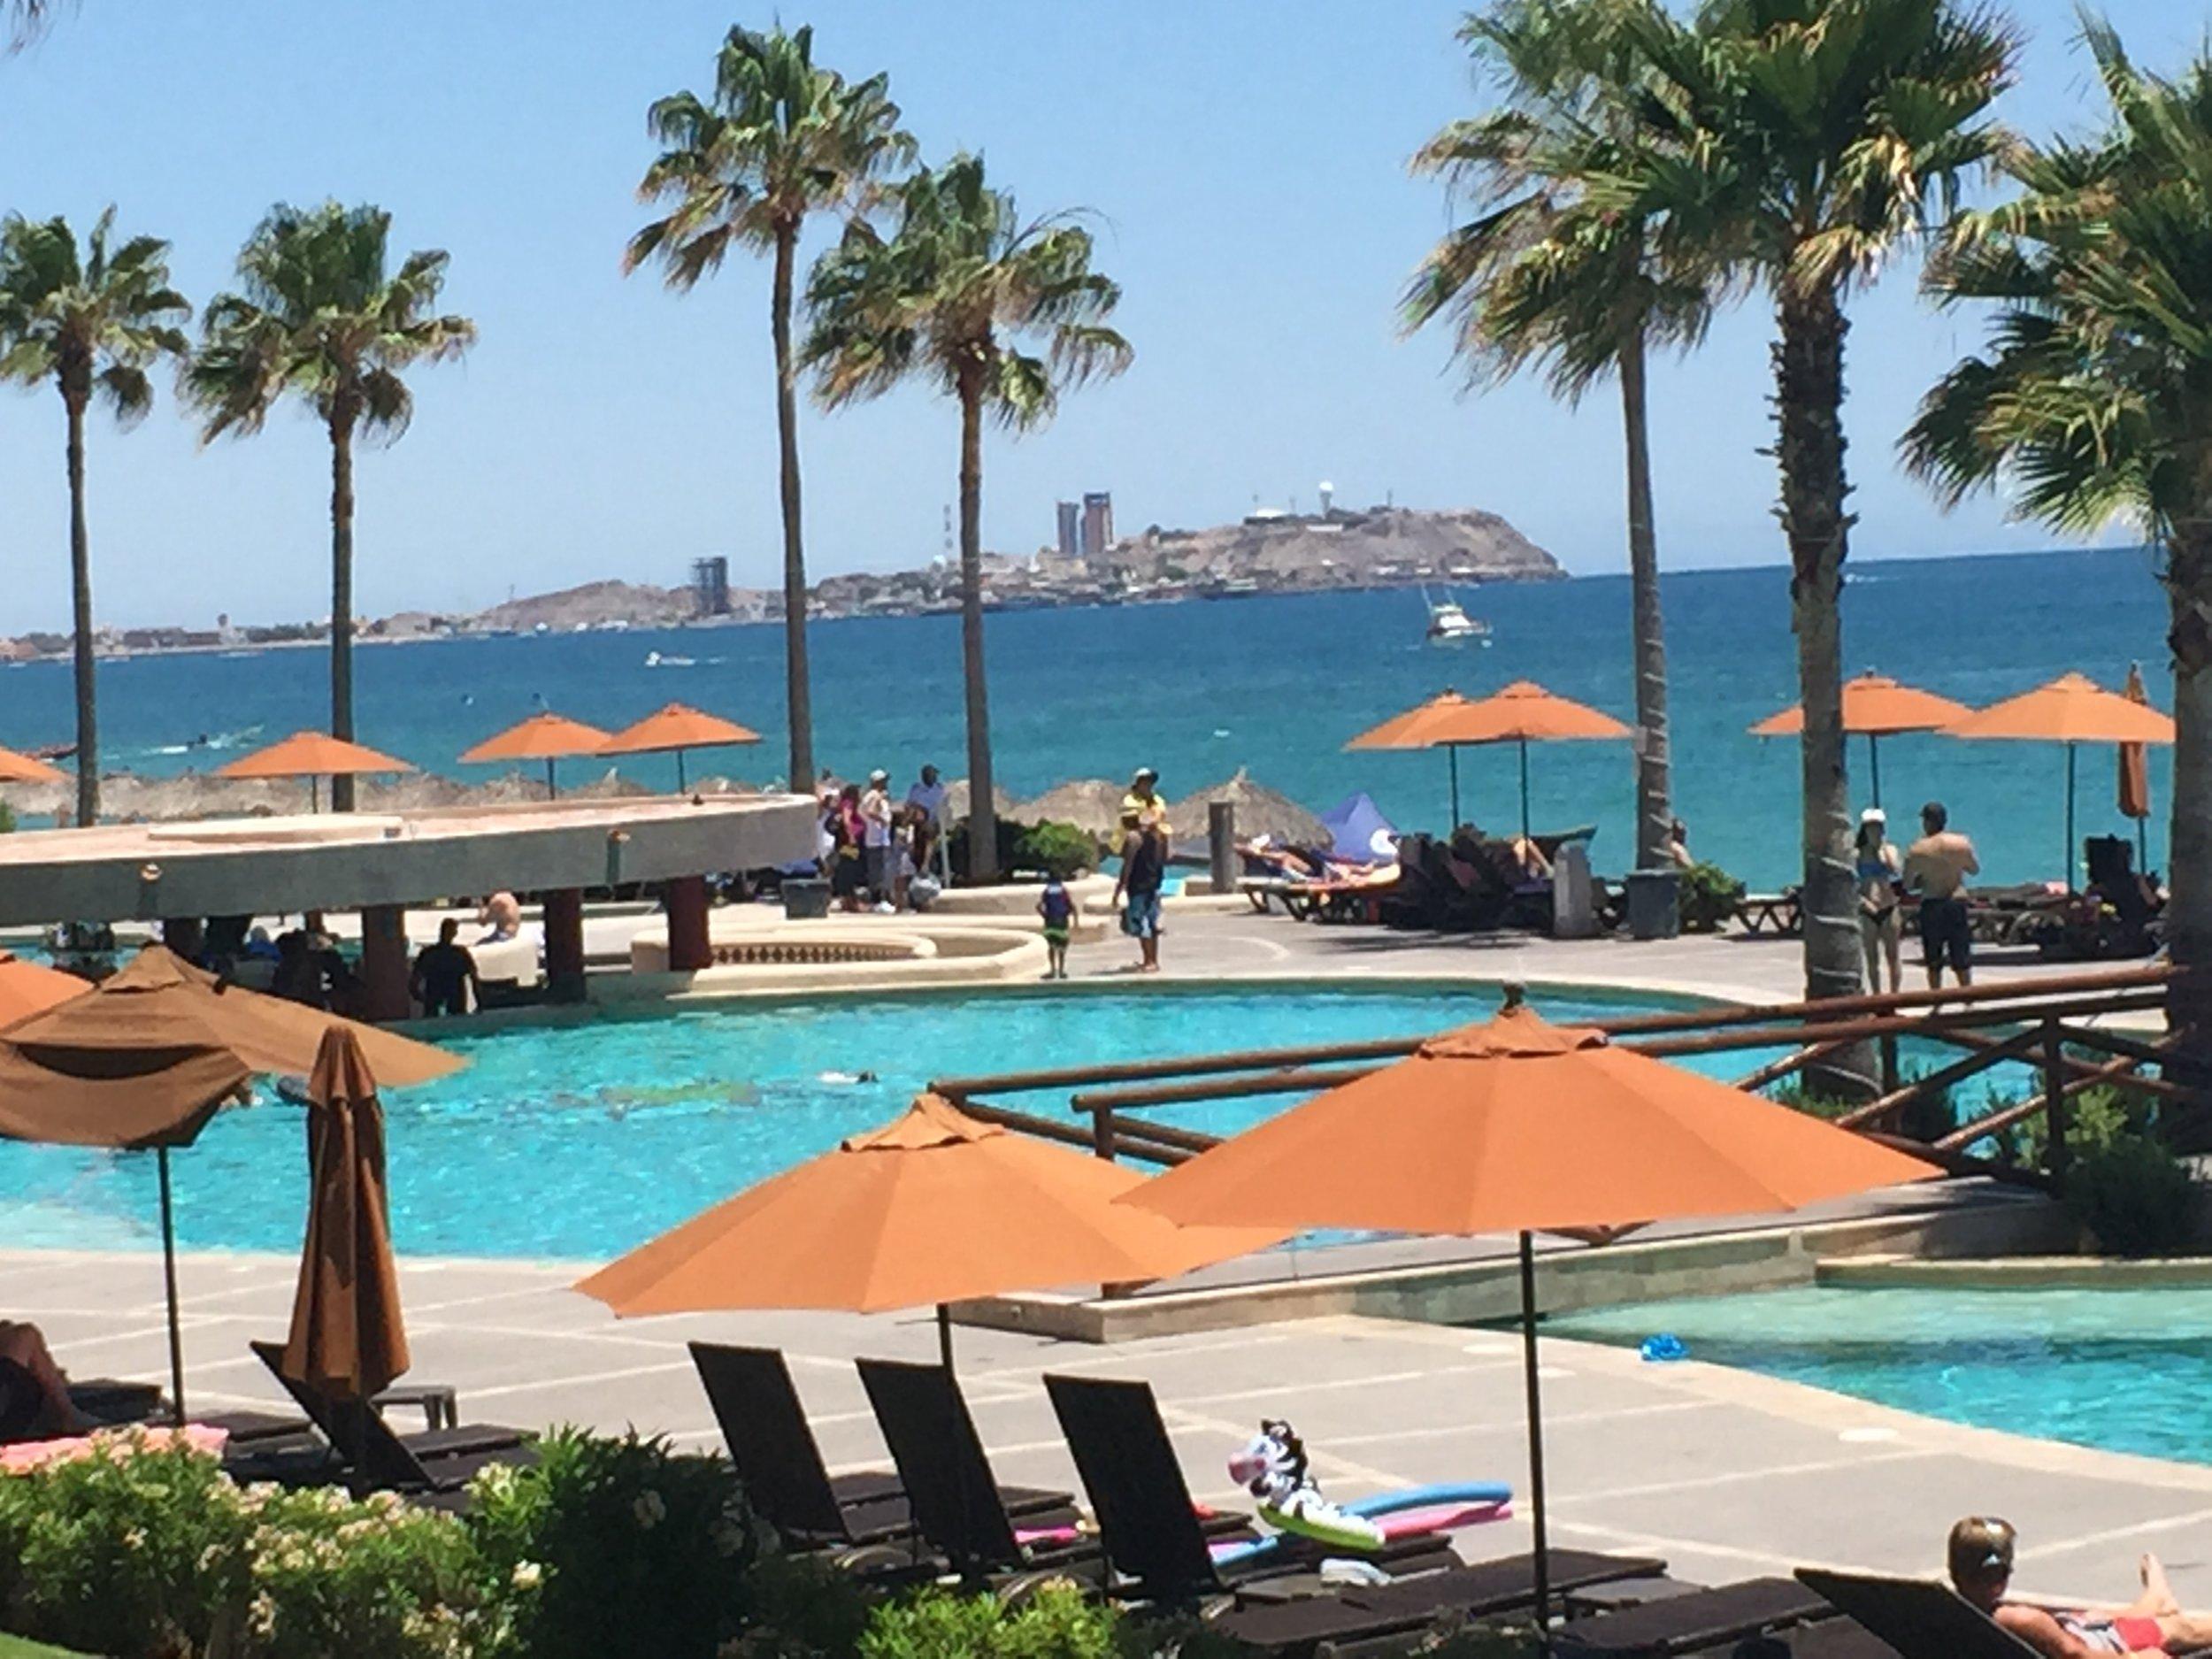 Beautiful Grounds at The Sonoran Sea Resort